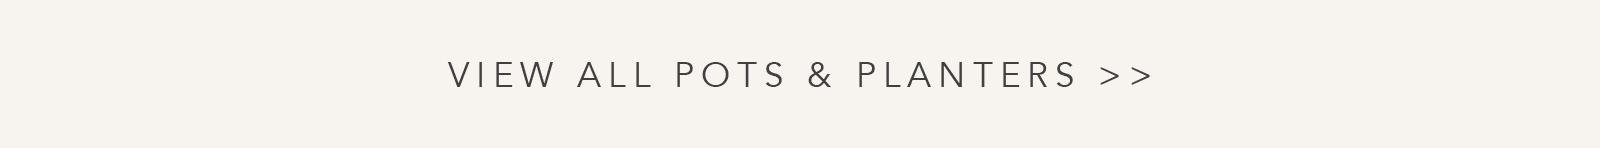 Shop All Pots & Planters